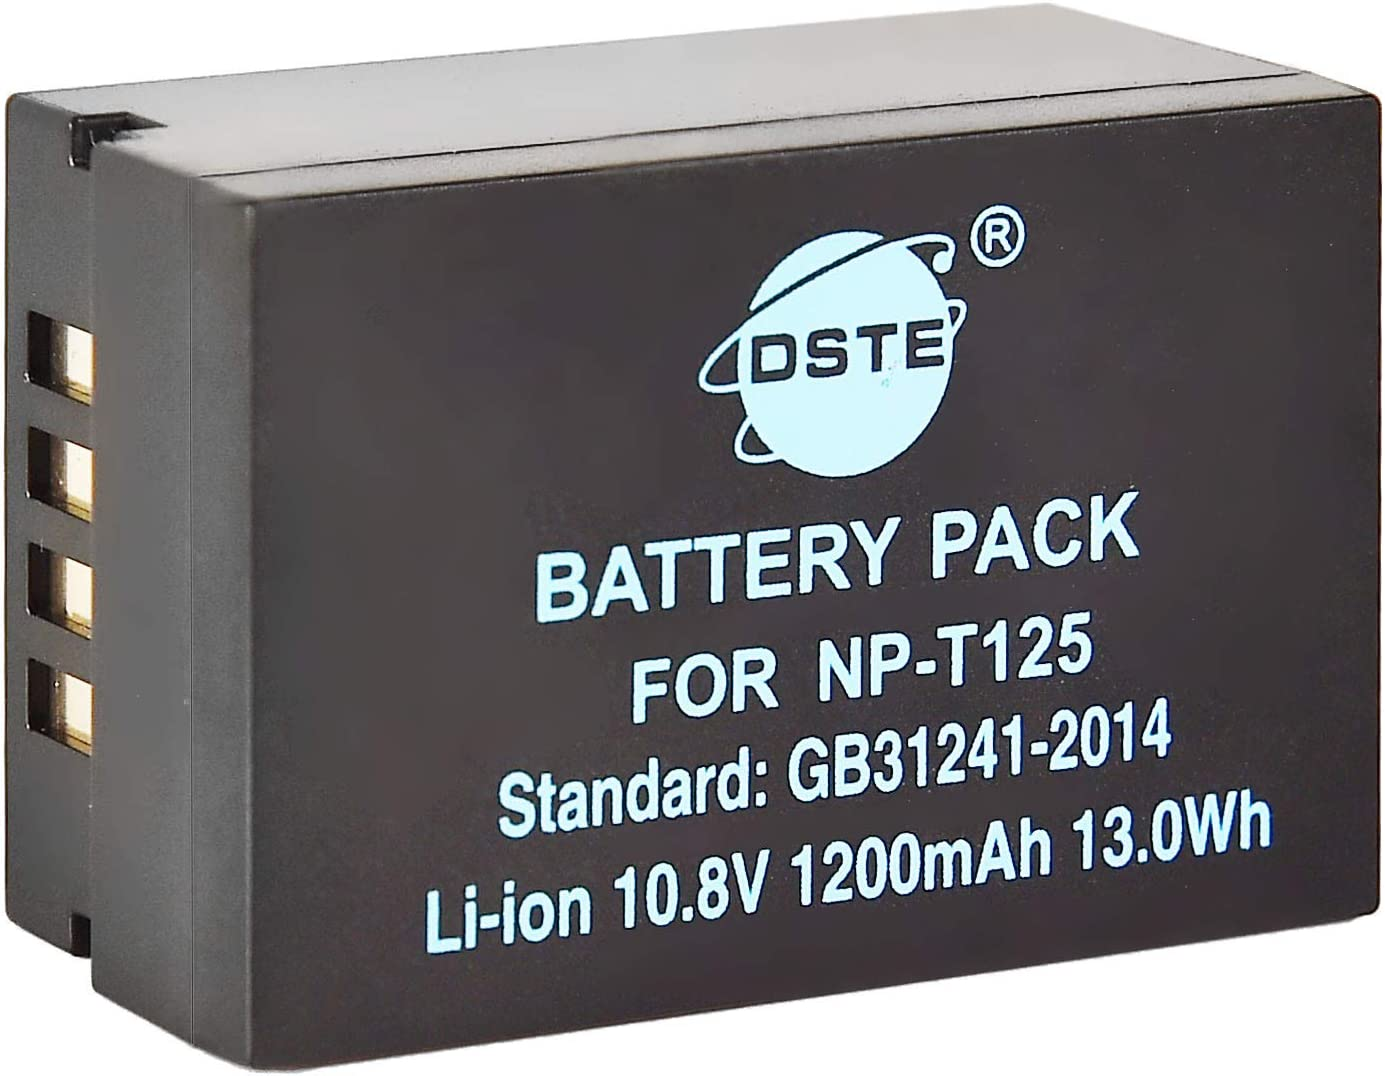 DSTE Replacement for NP-T125 Li-ion Battery Compatible Fujifilm GFX 50R GFX50R GFX 50S GFX50S GFX 100 Camera Compatible Fuji VG-GFX1 Vertical Battery Grip